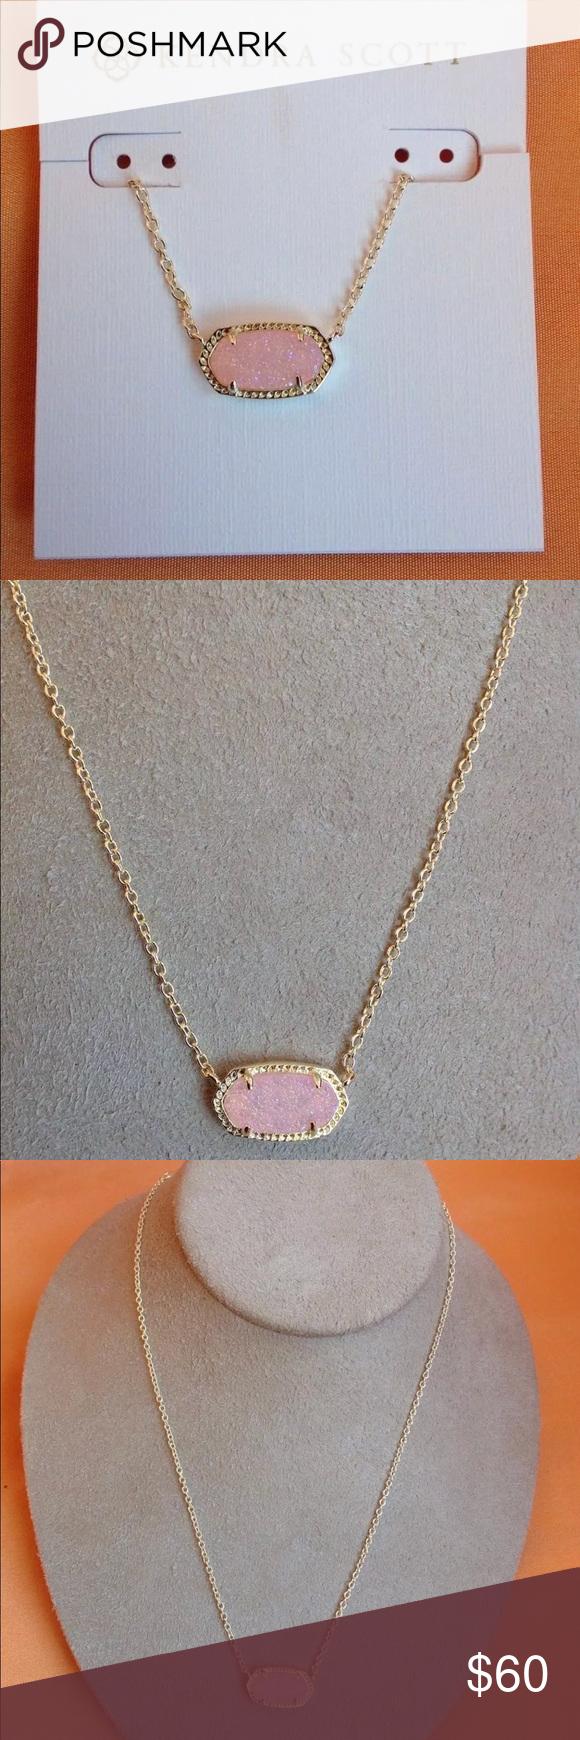 Kendra Scott Elisa Light Pink Druzy Gold Pendant Boutique Pink Druzy Gold Pendant Gold Pendant Necklace